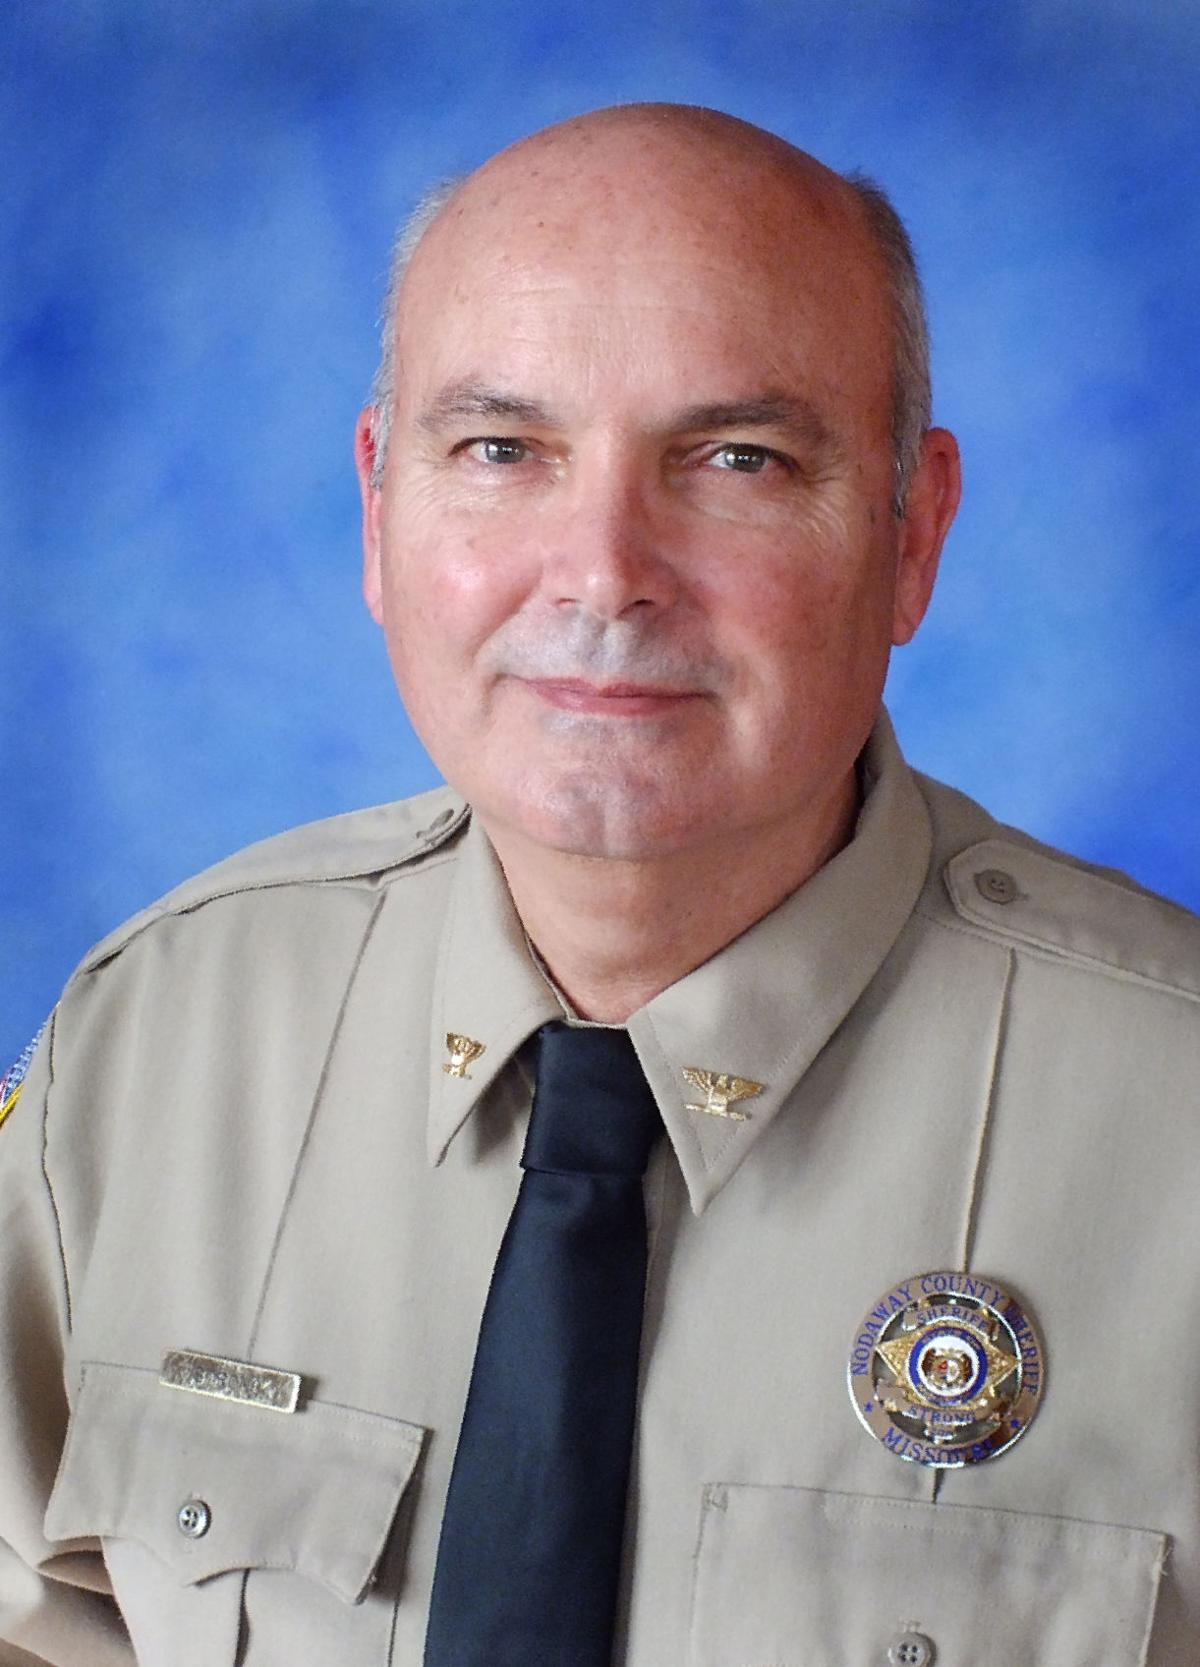 Sheriff Randy Strong